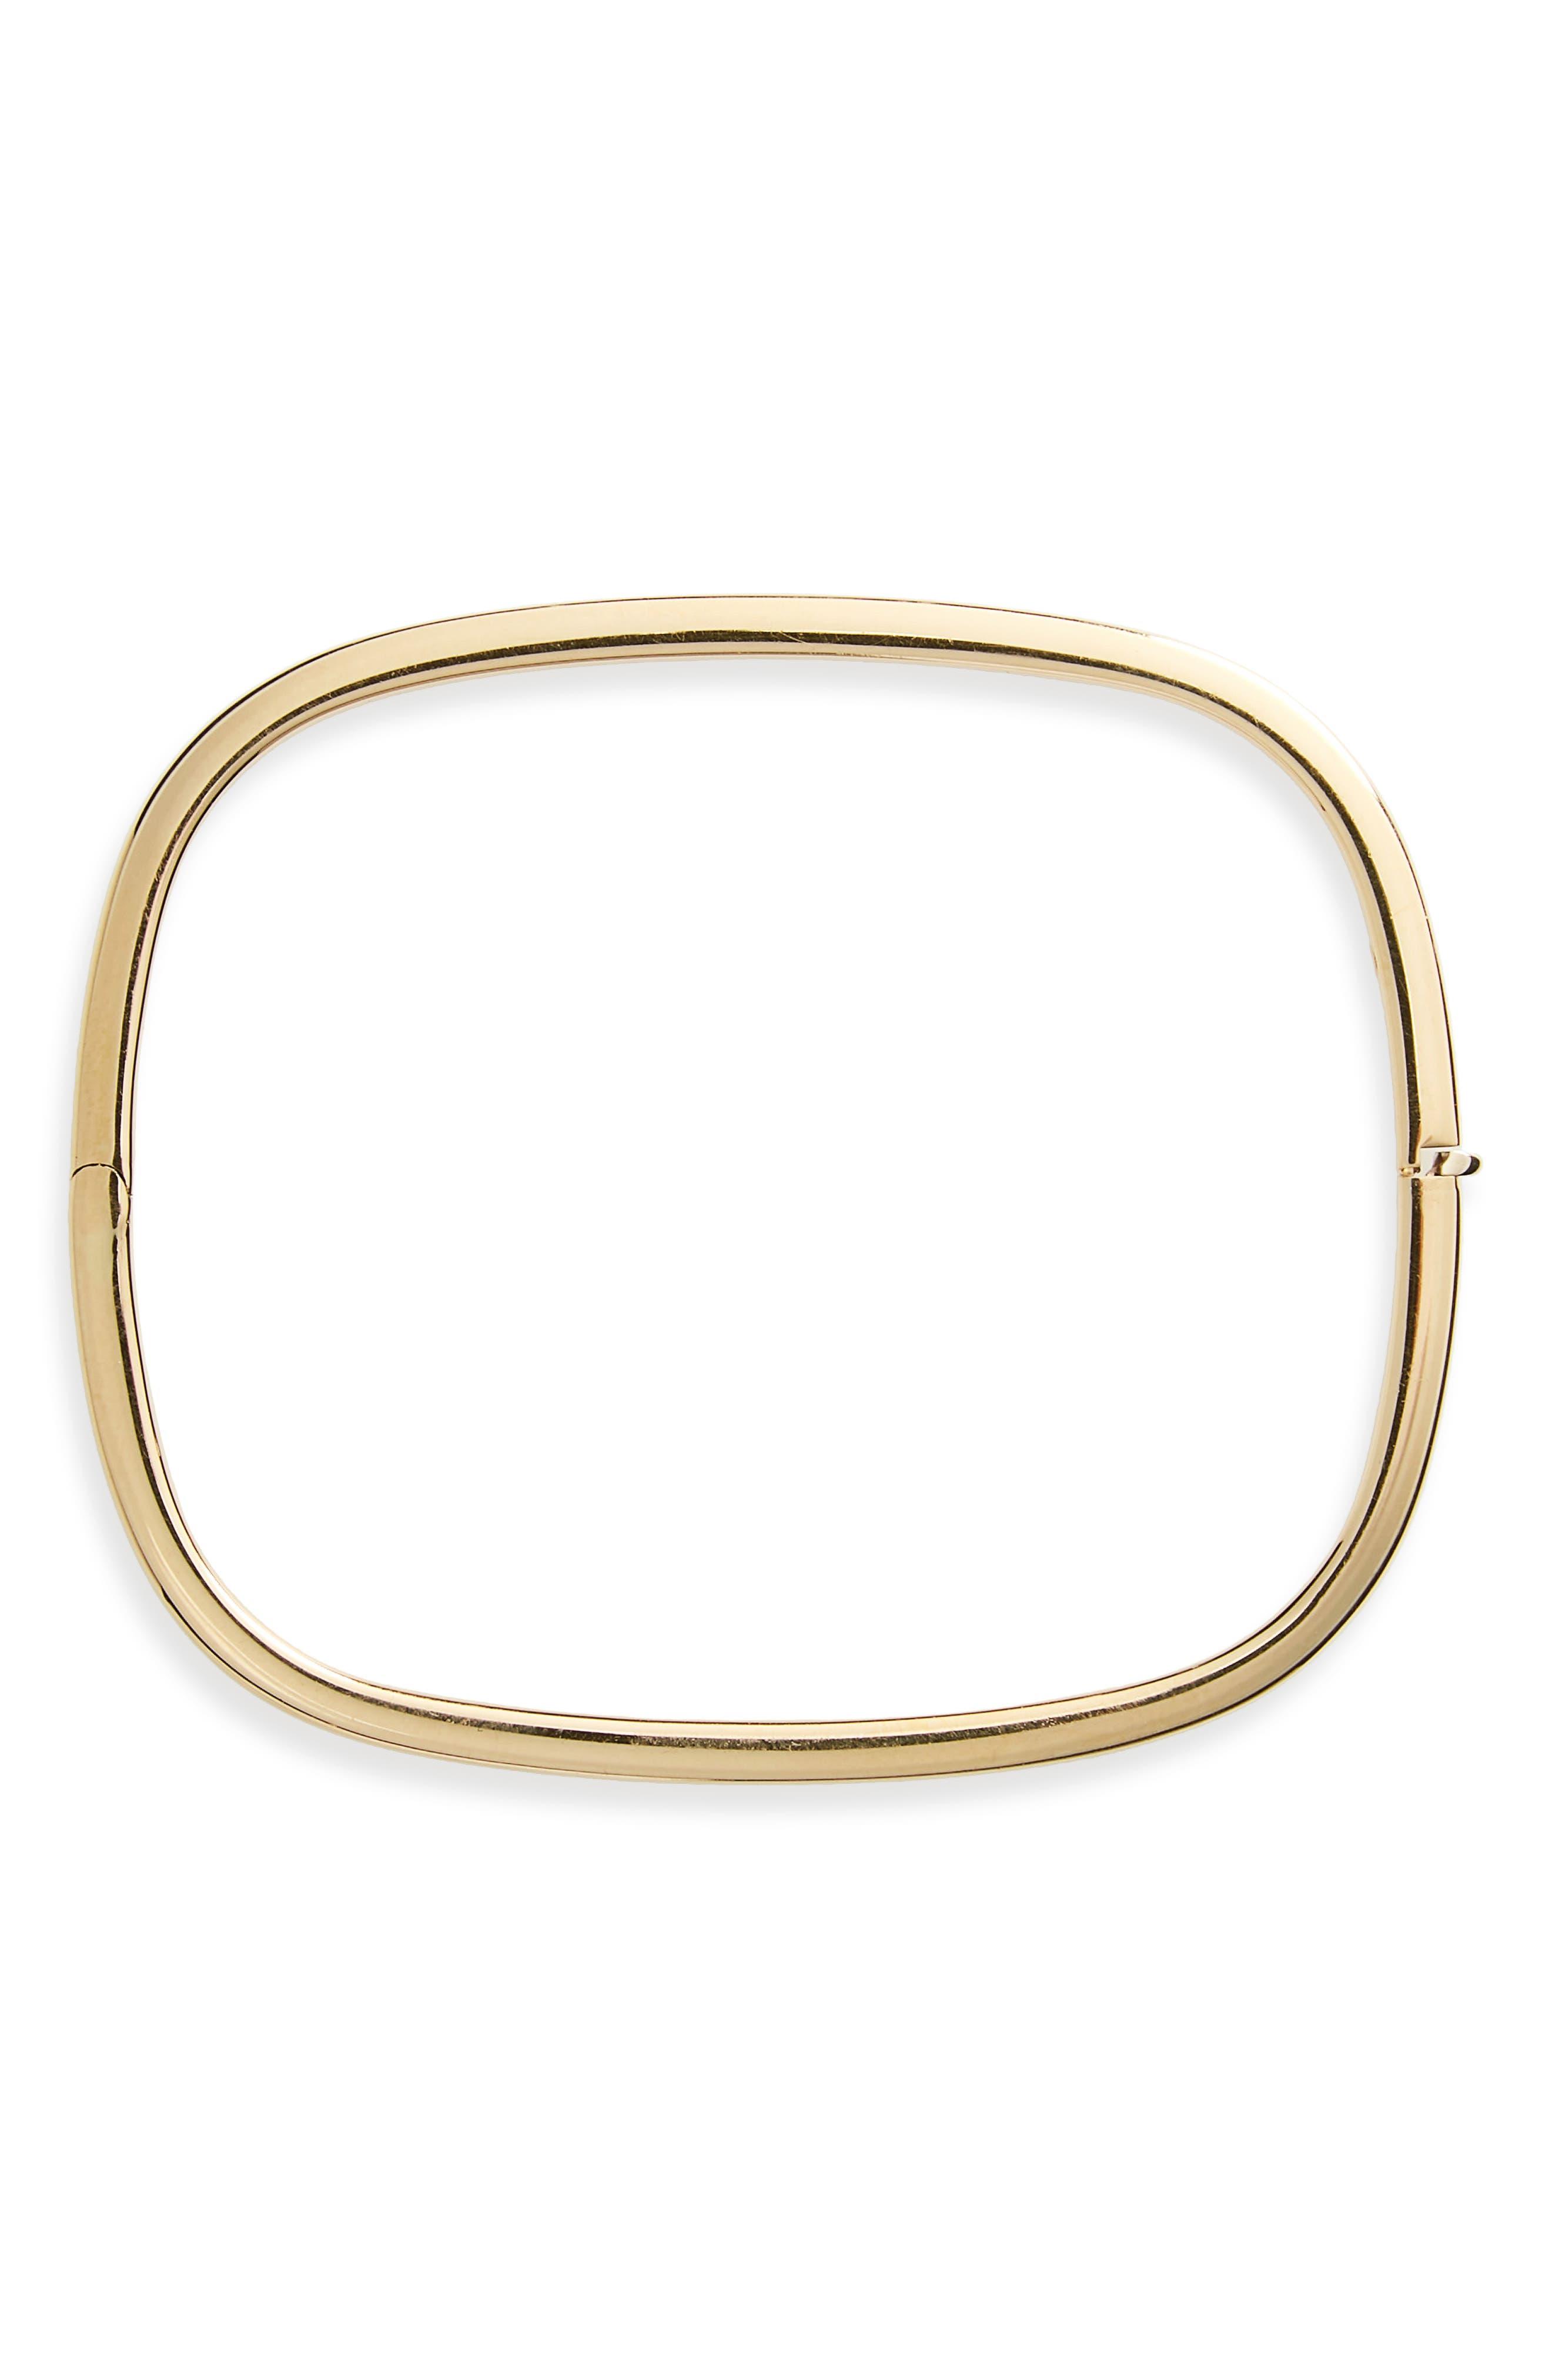 Soft Square Bangle Bracelet,                         Main,                         color, 18Kyg